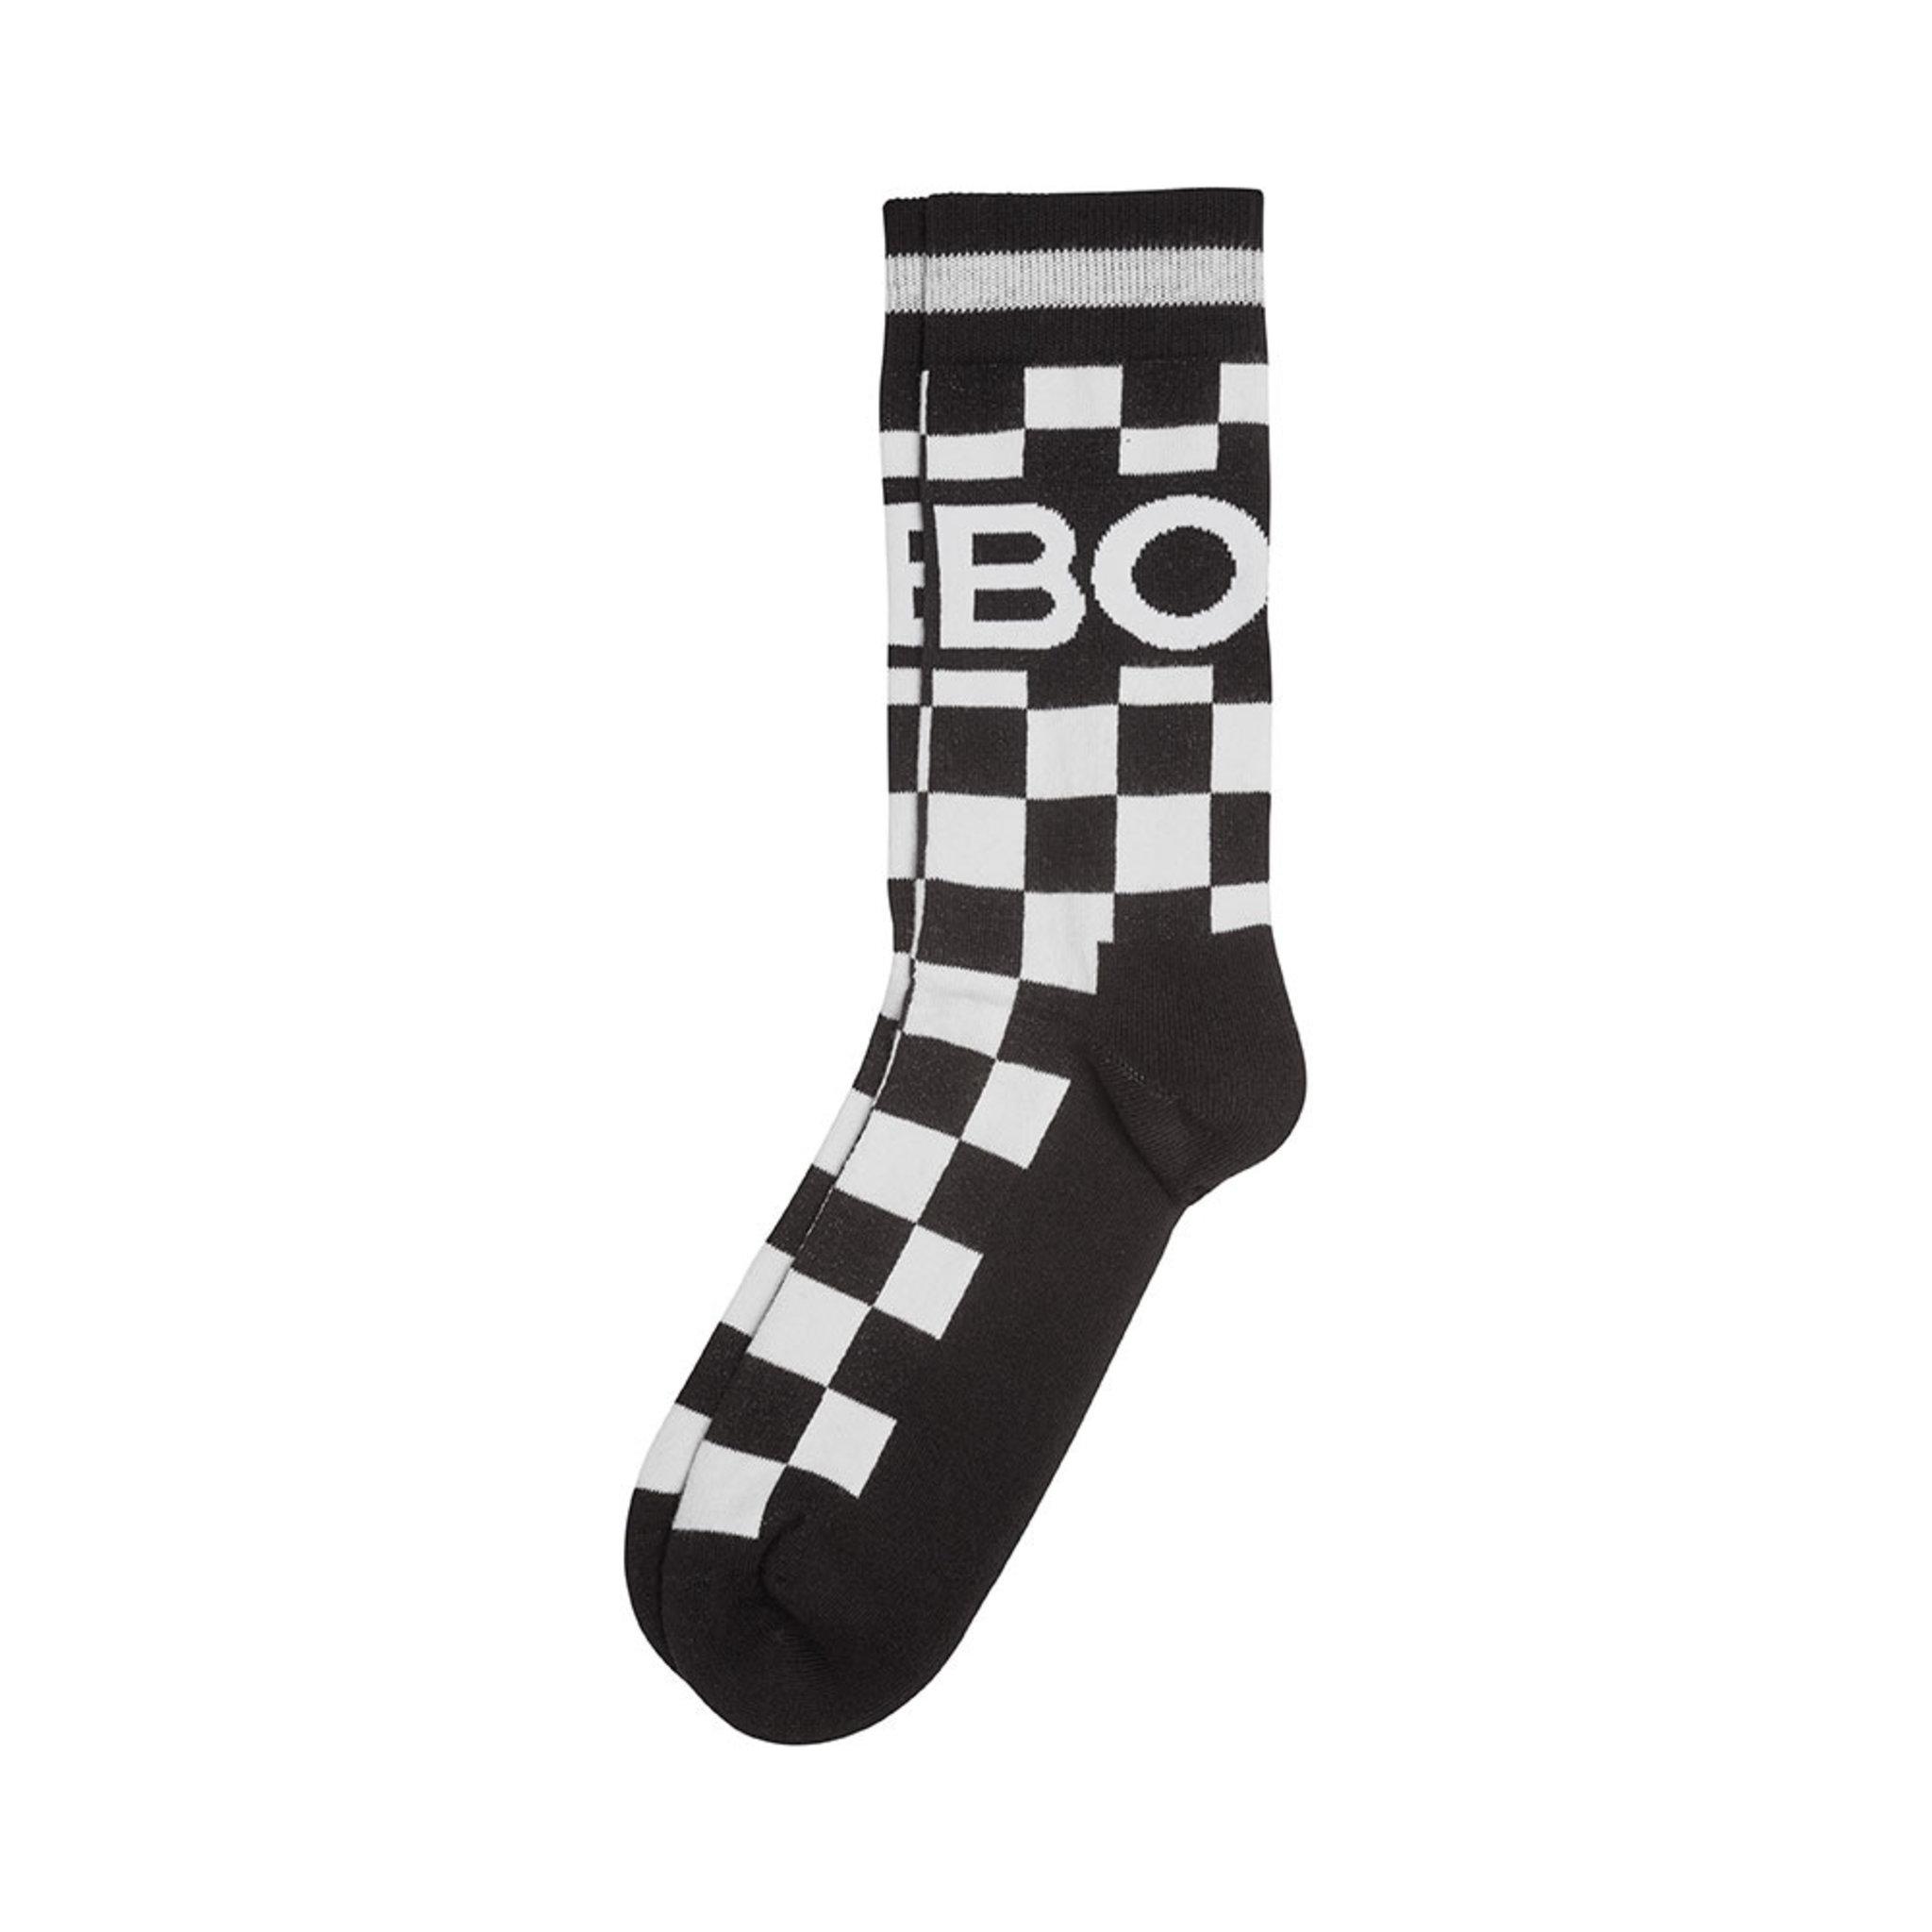 Square Borg Sock